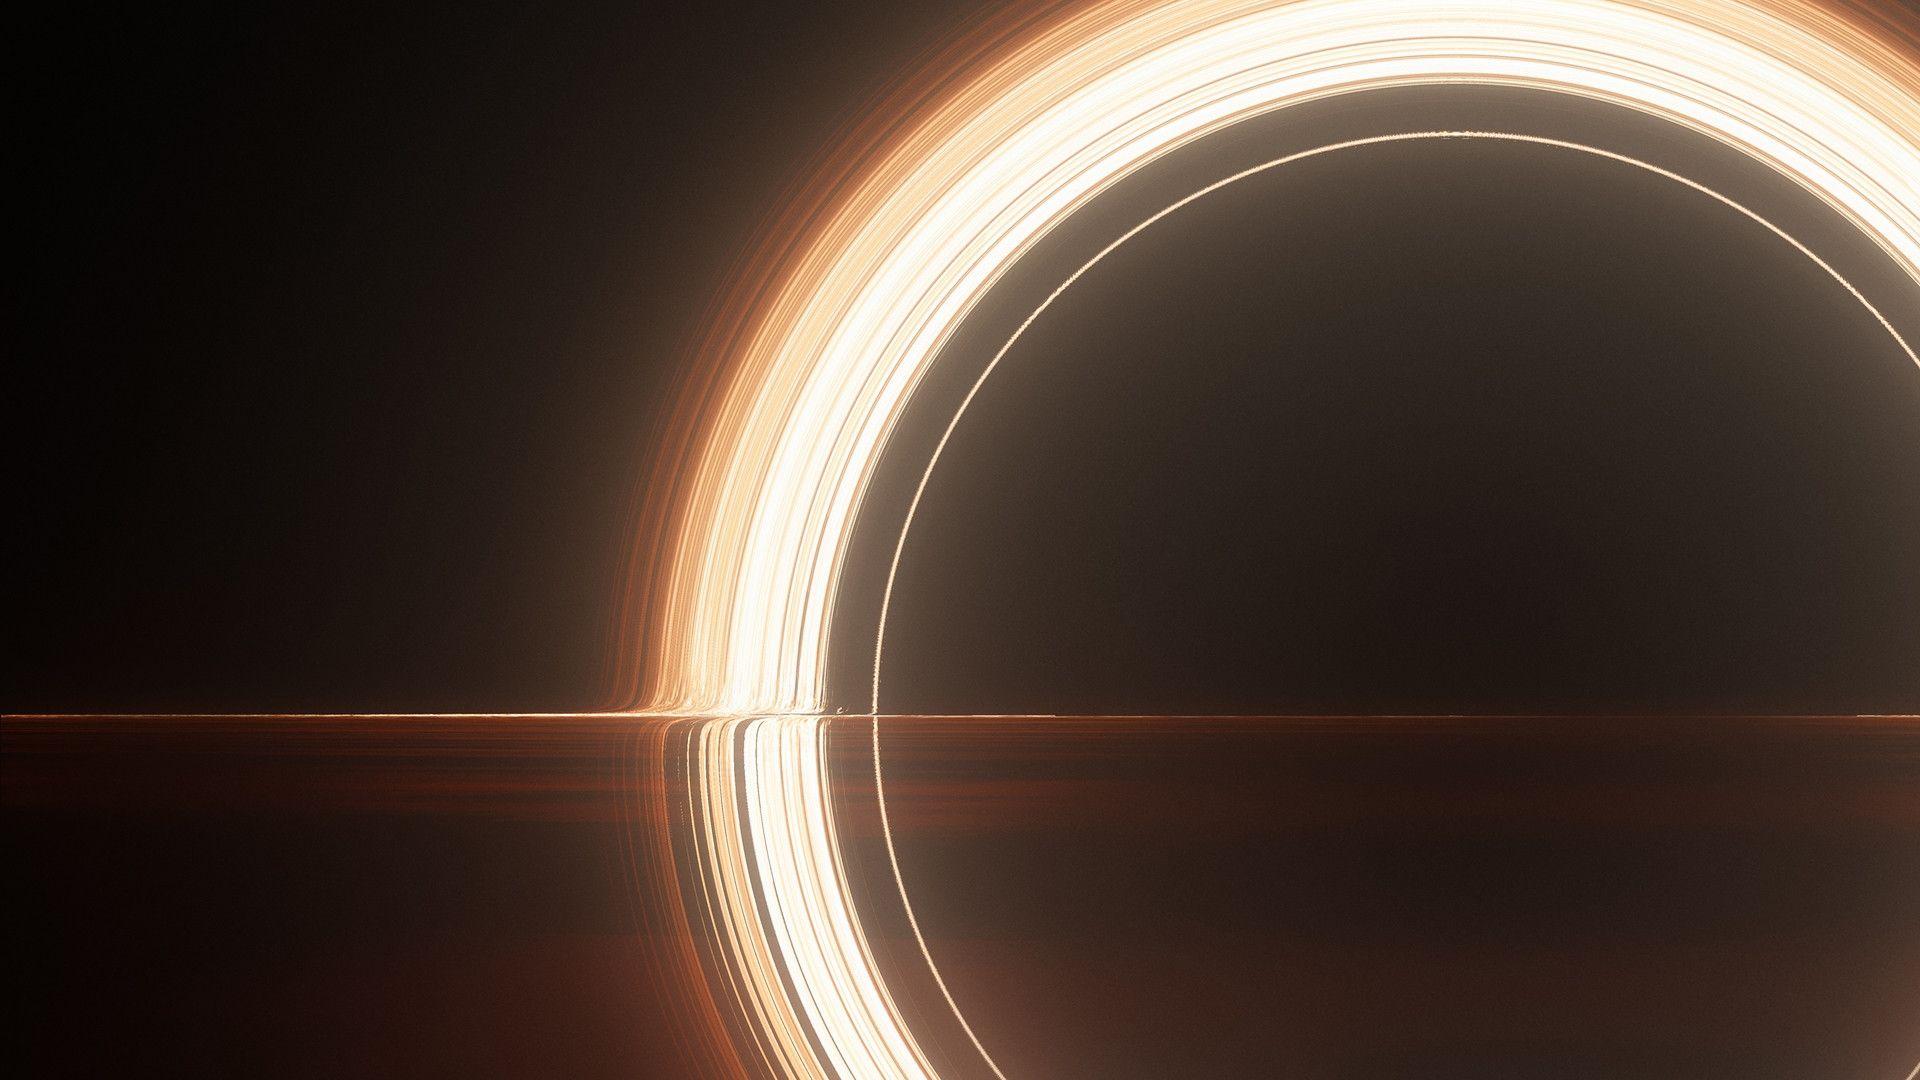 14 Black Hole Interstellar Wallpapers Wallpaperboat